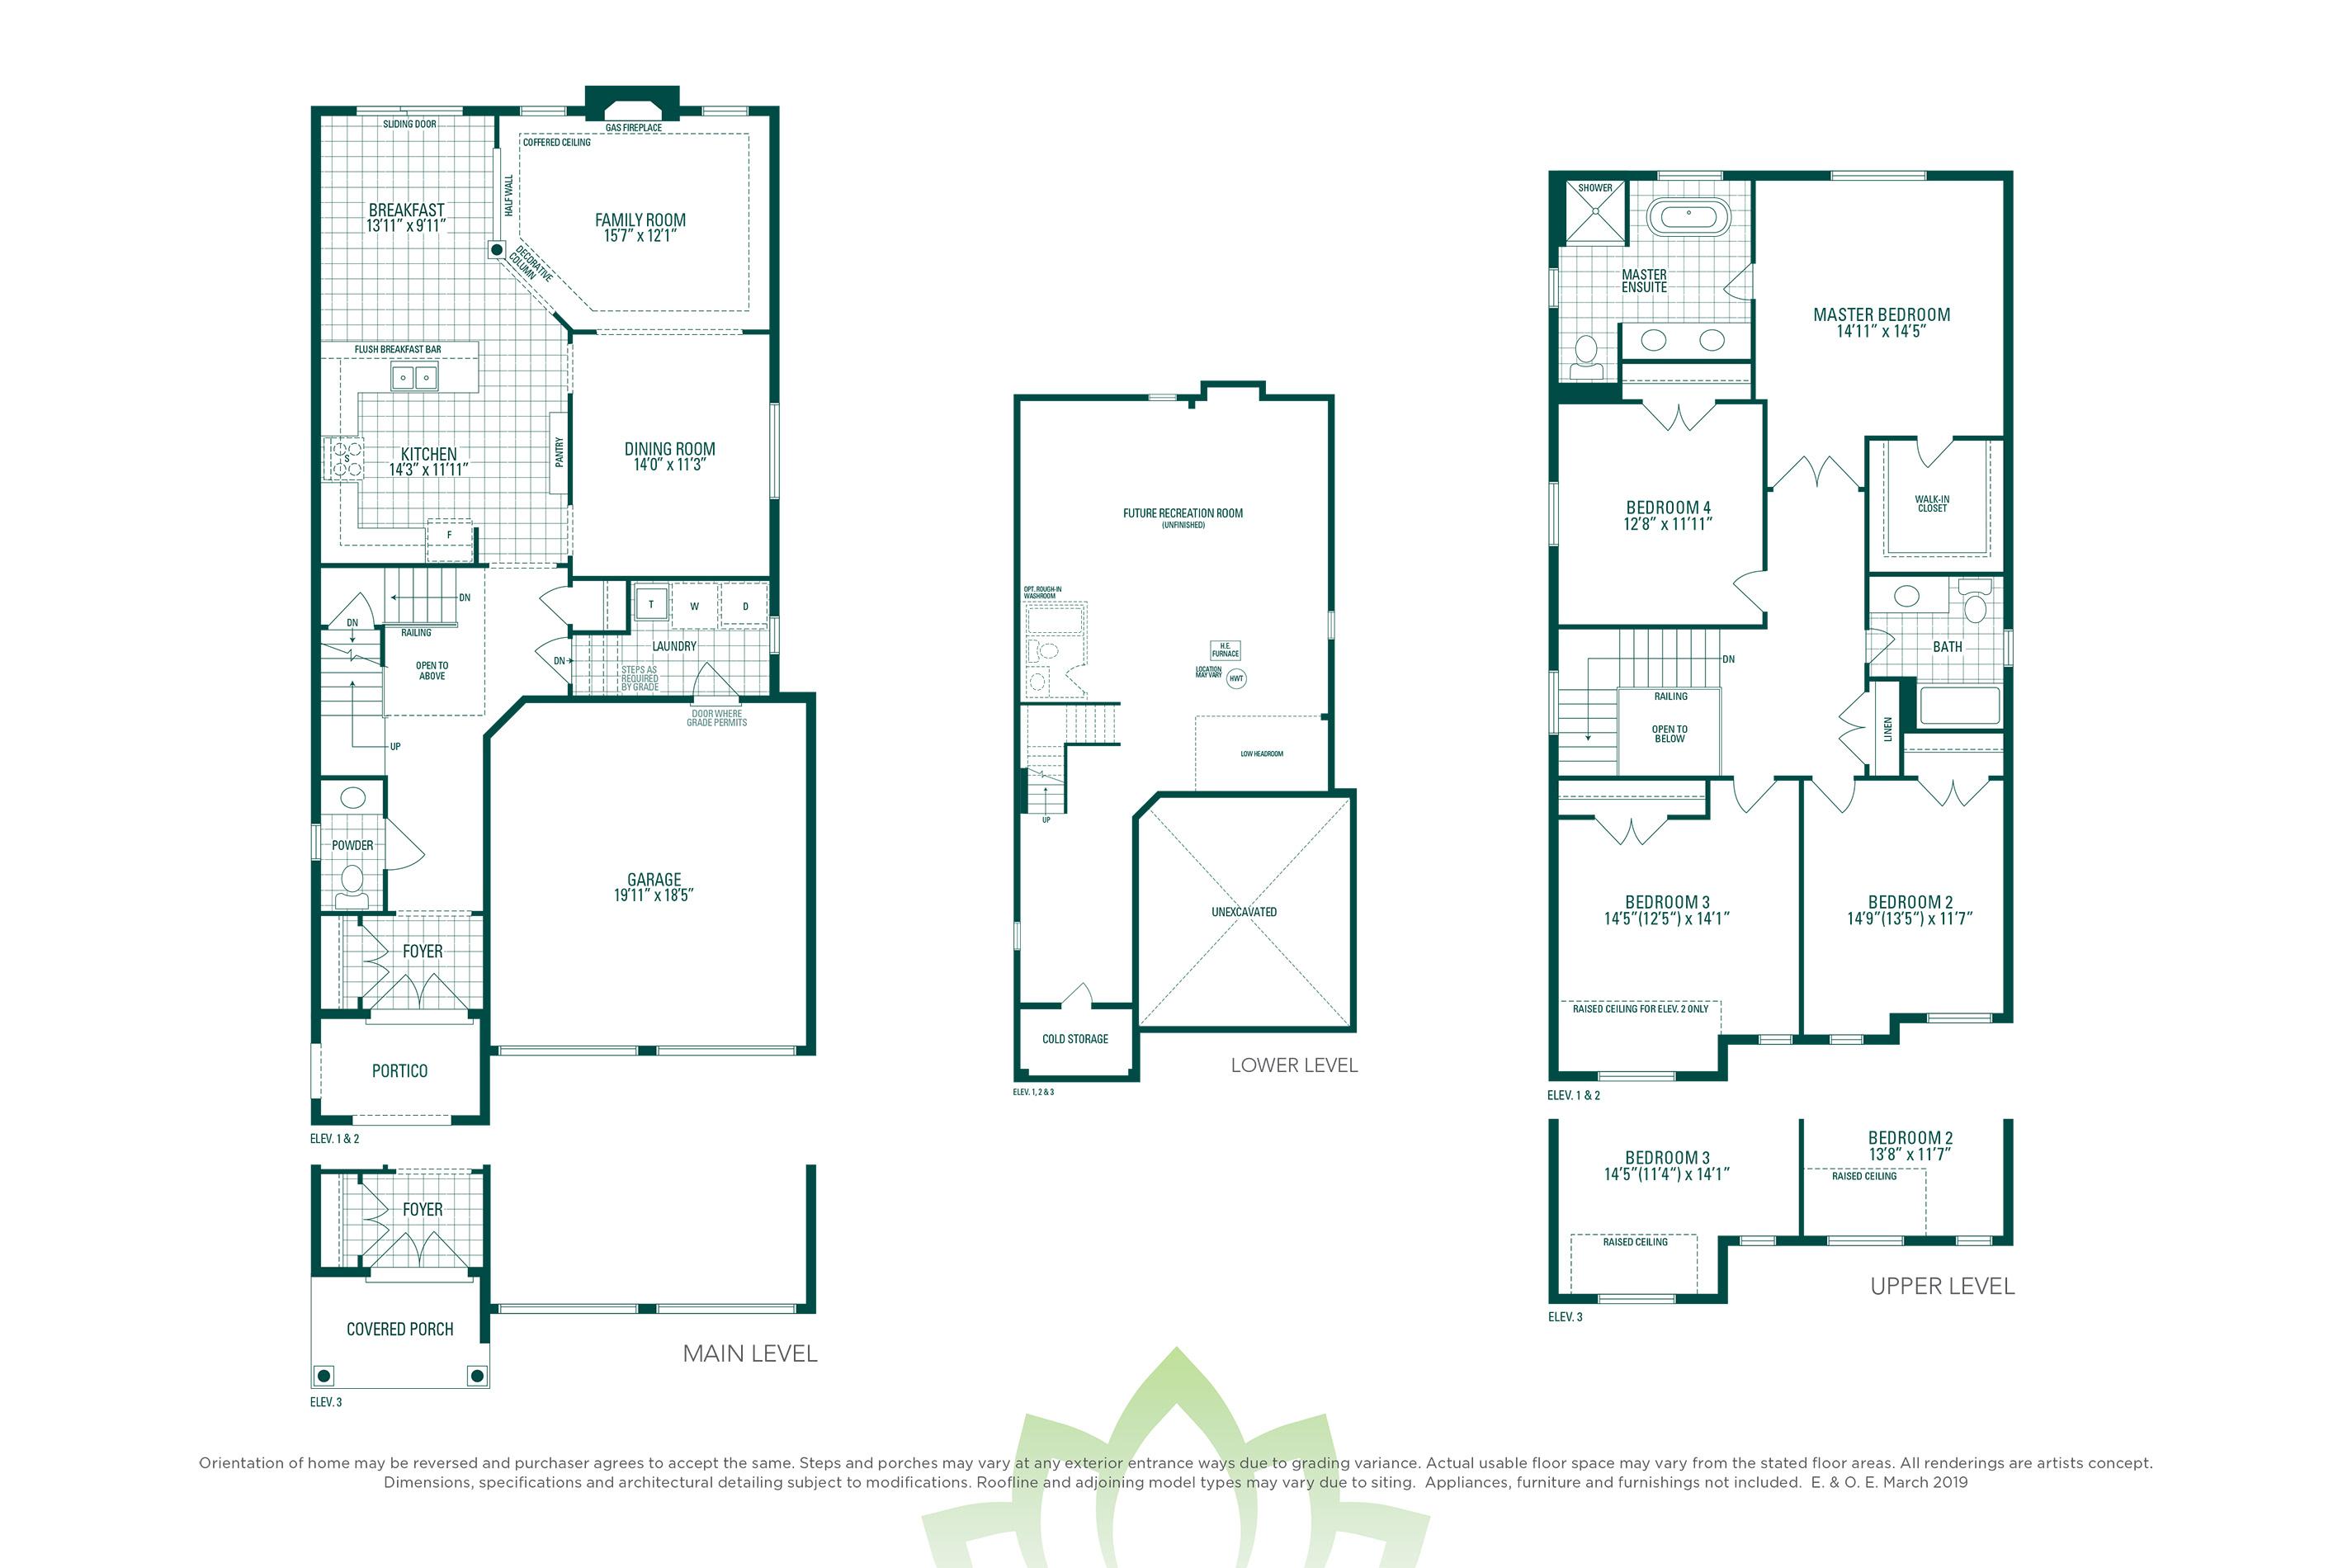 Brentwood 1A Floorplan